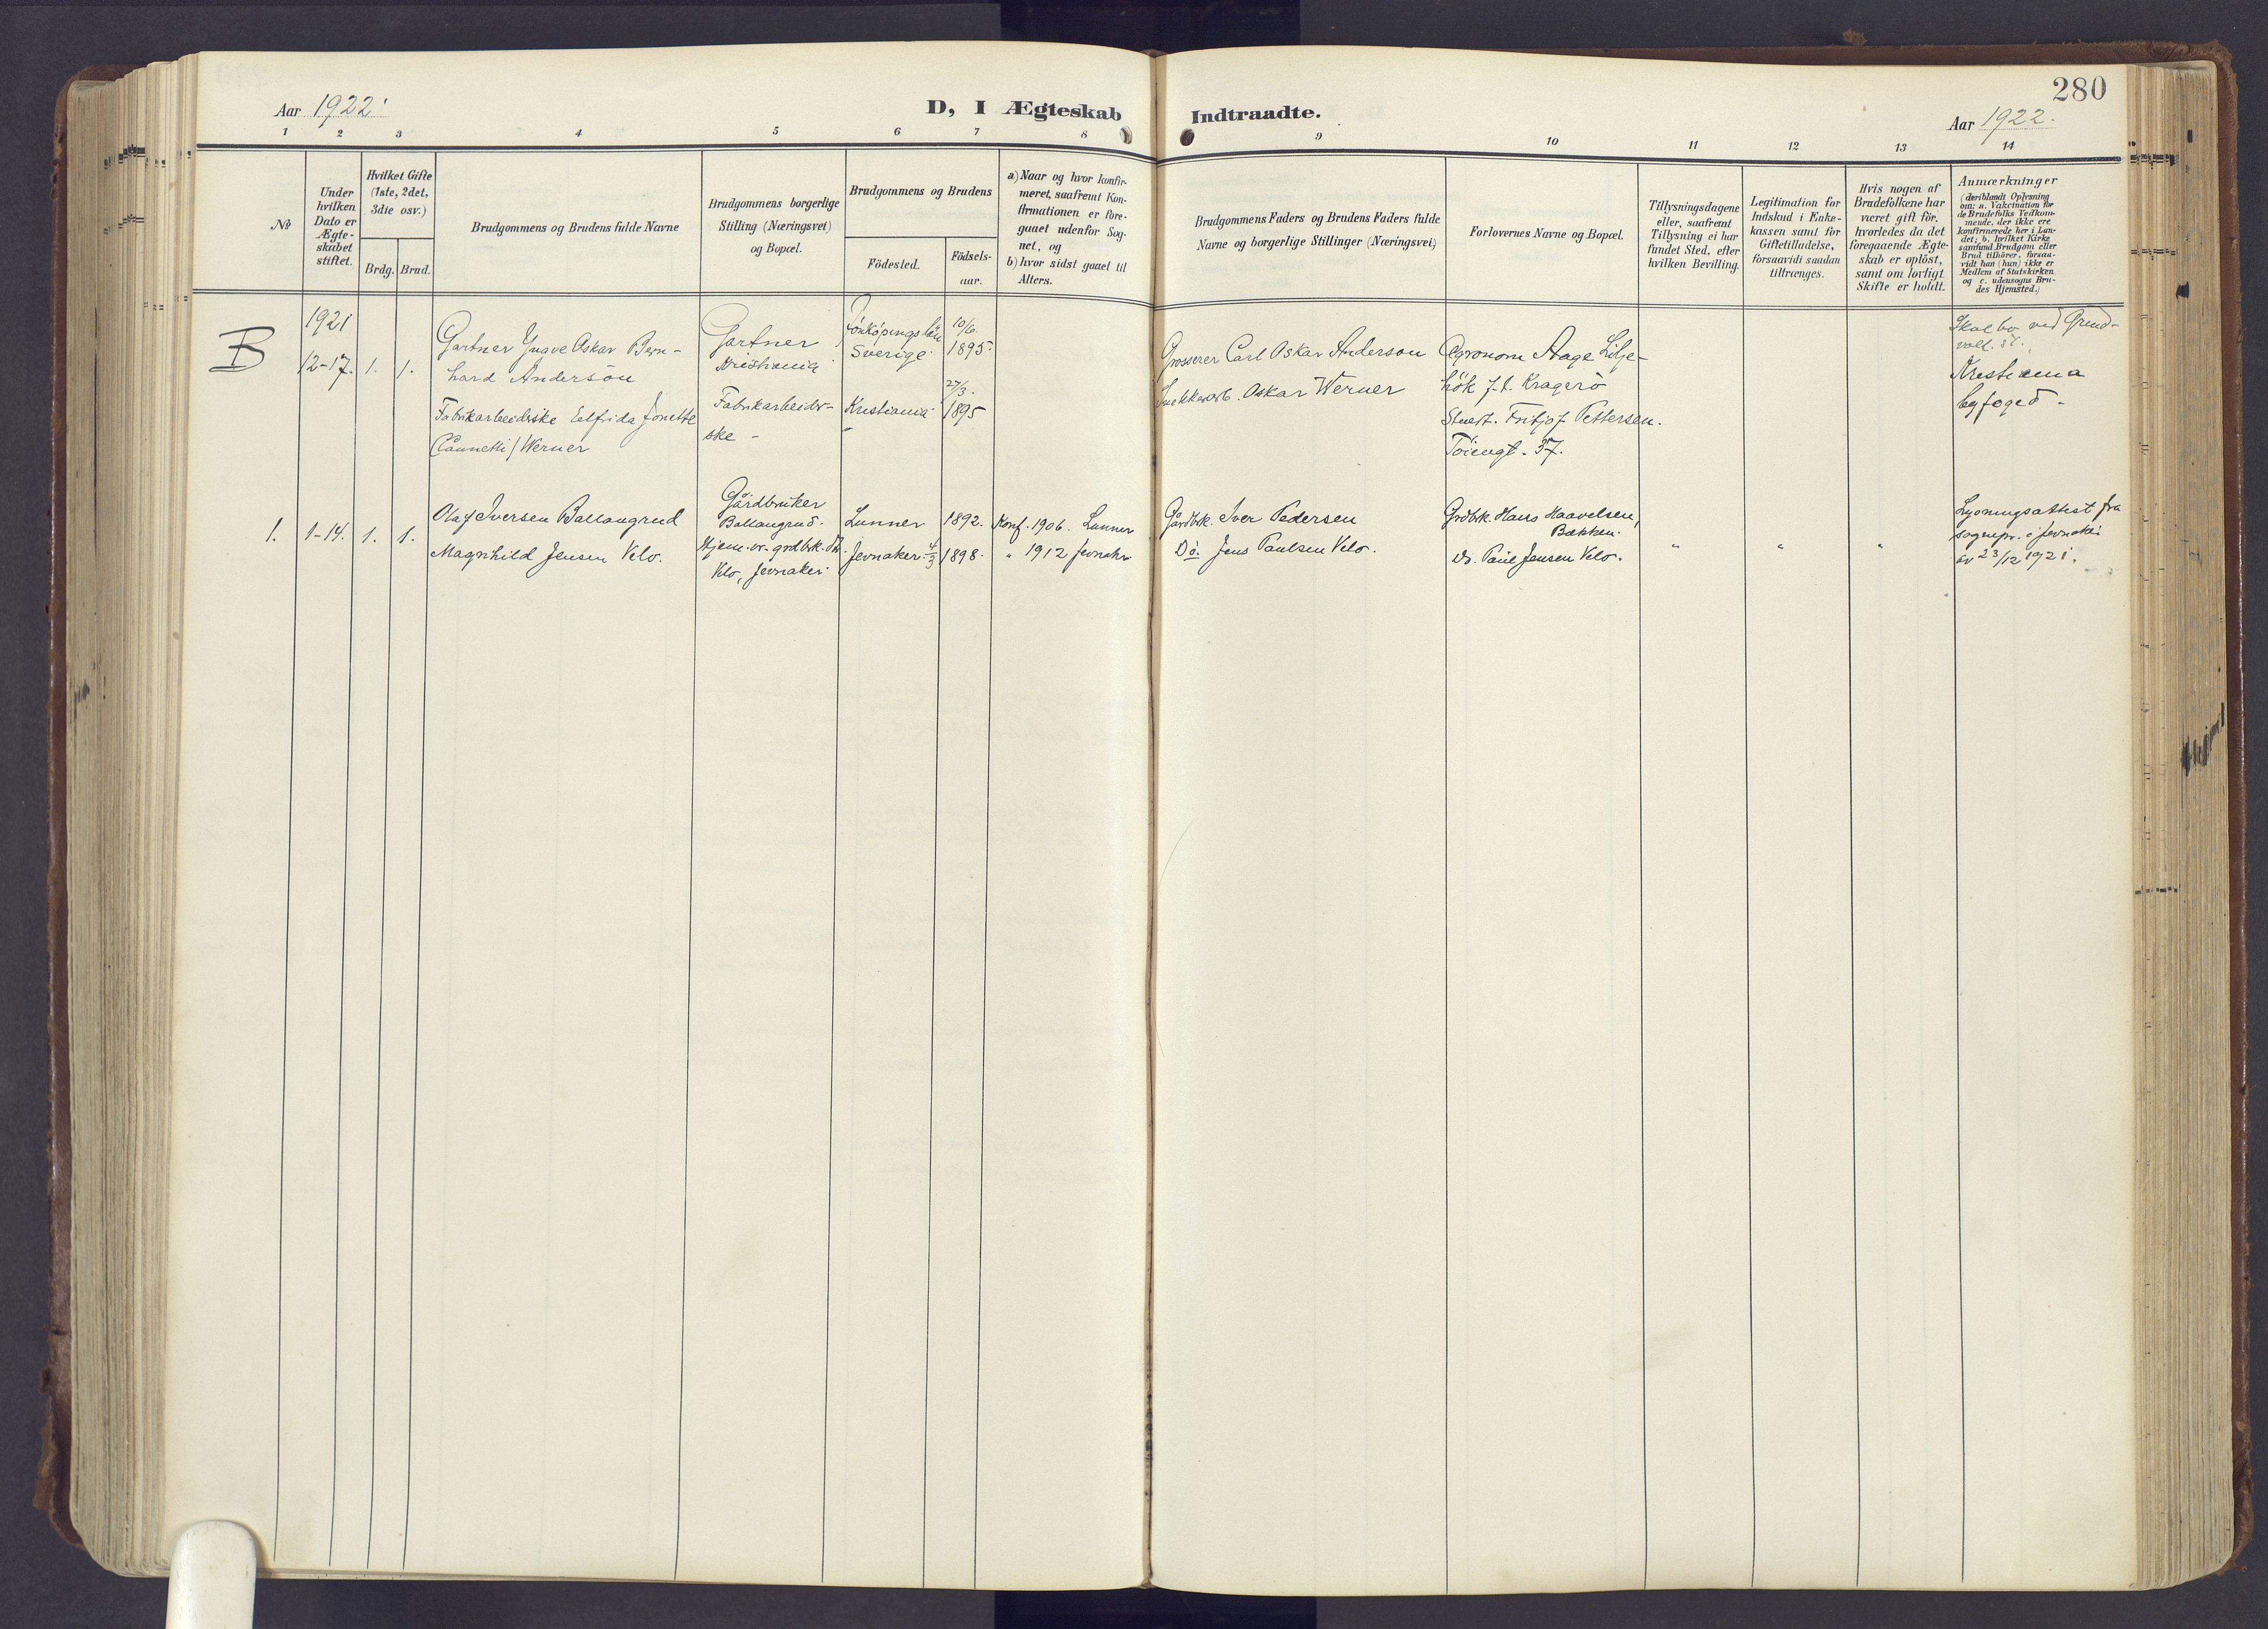 SAH, Lunner prestekontor, H/Ha/Haa/L0001: Ministerialbok nr. 1, 1907-1922, s. 280